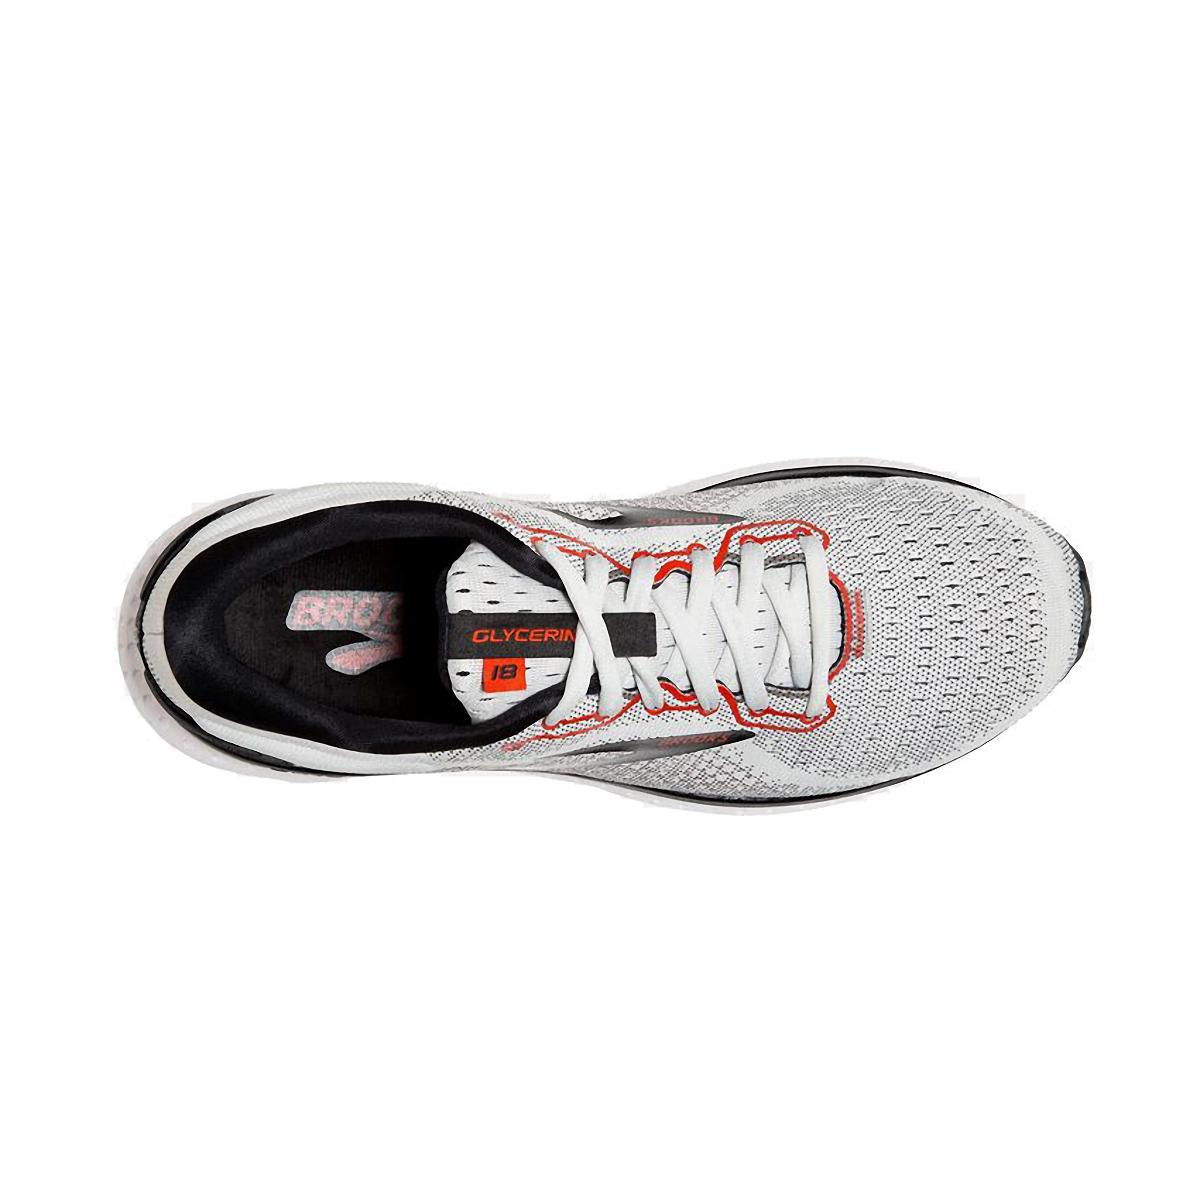 Men's Brooks Glycerin 18 Running Shoe - Color: White/Black/Red - Size: 7 - Width: Regular, White/Black/Red, large, image 5